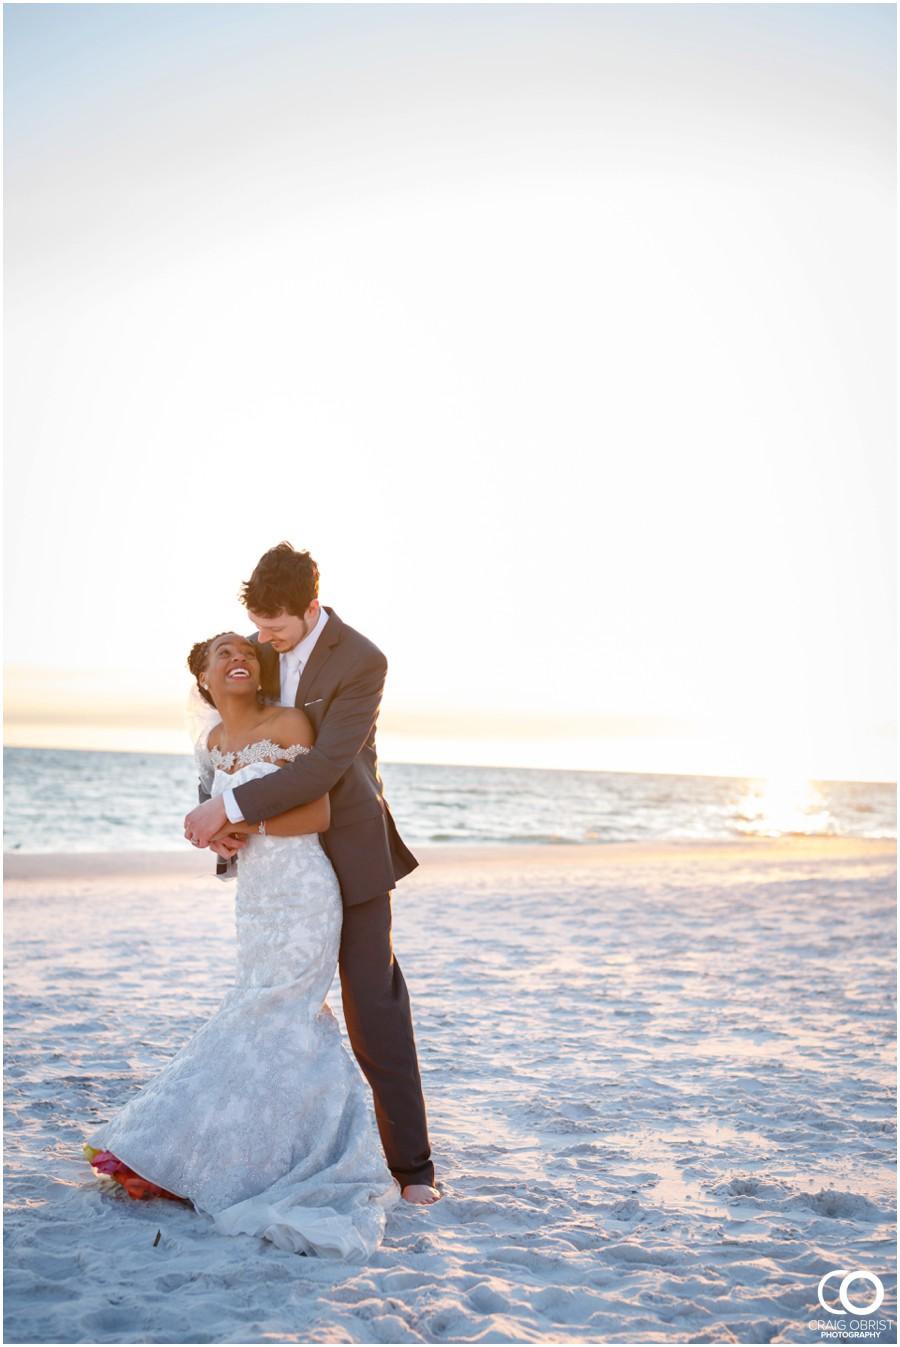 Seaside-30A-Beachside-Wedding-Sunset-Santa-Rosa-Photographer_0084.jpg